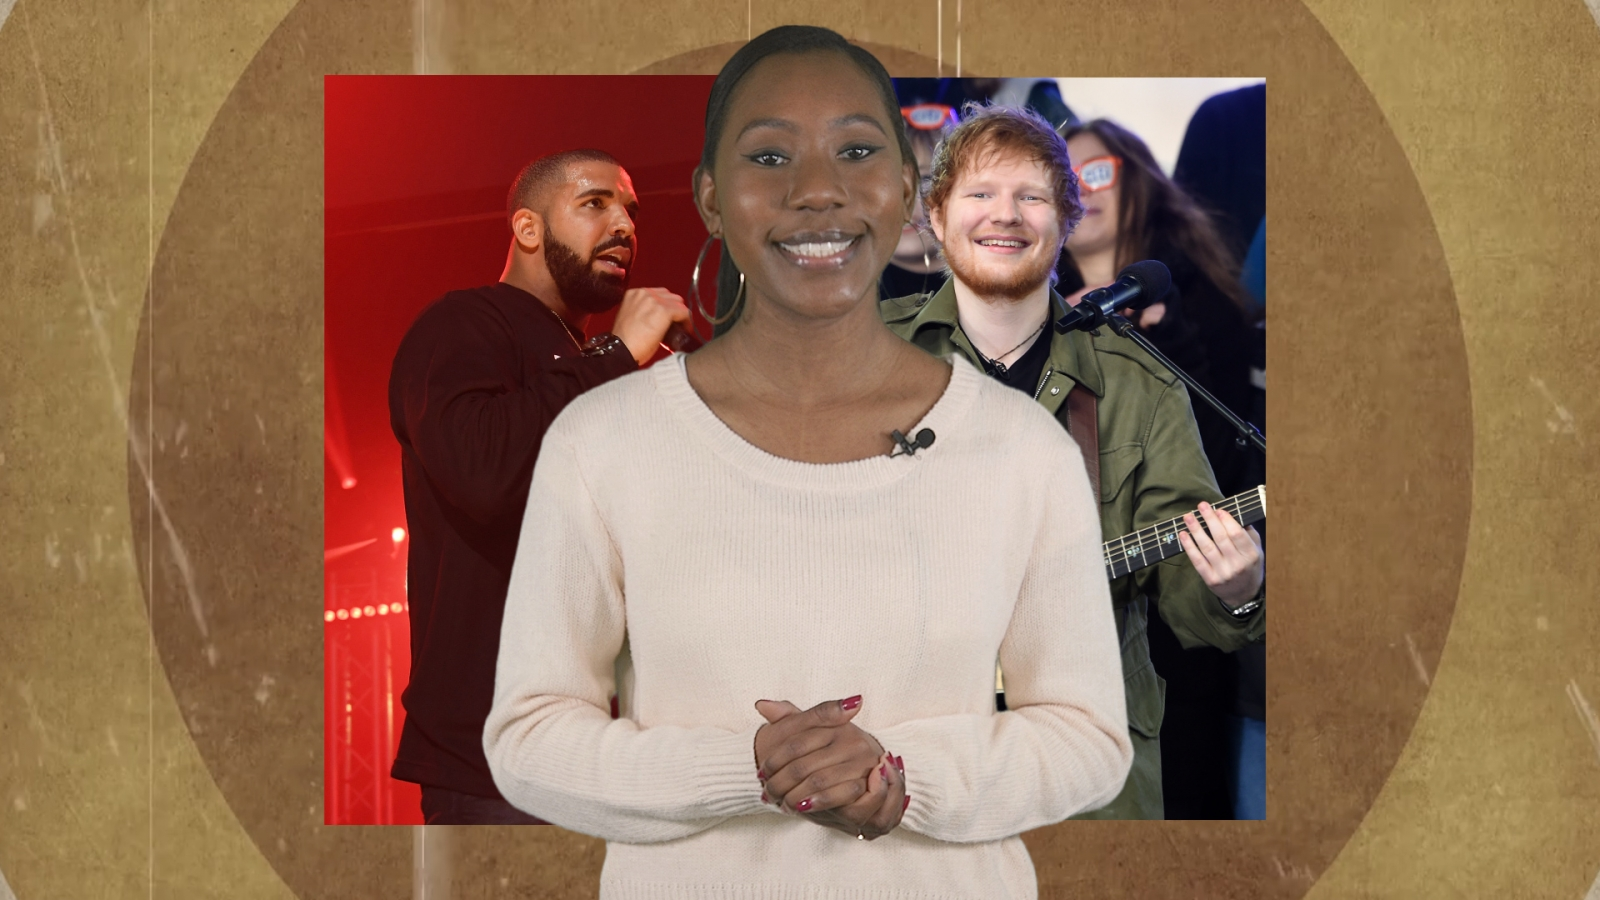 Music Minute: Ed Sheeran dominates UK charts, Drake to release new album